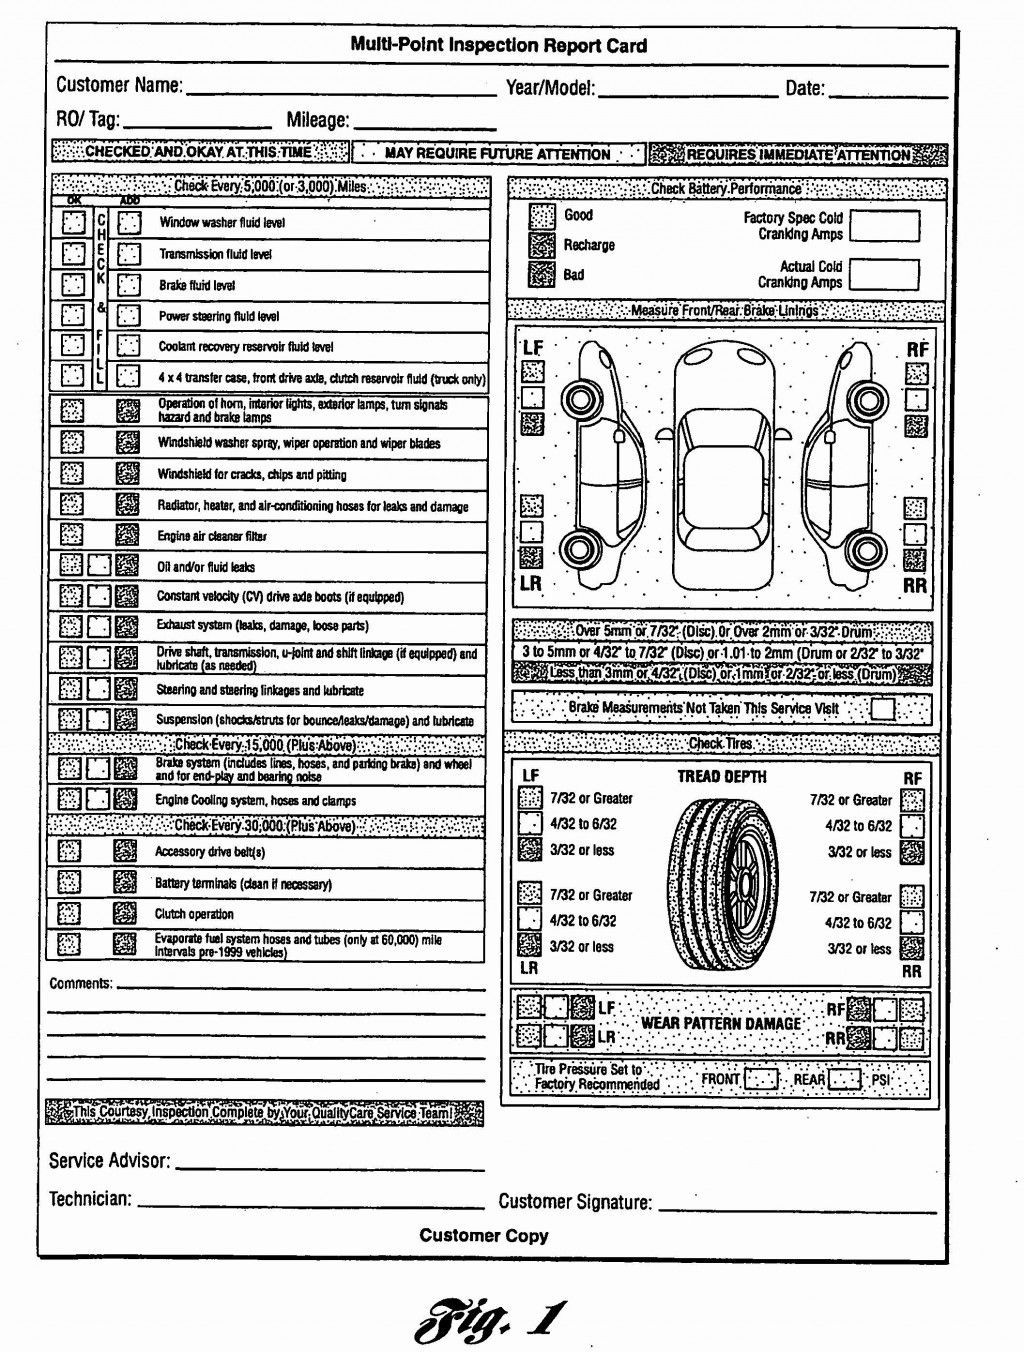 001 Fascinating Vehicle Inspection Checklist Template High Resolution  Safety Ontario Motor Kenya FormFull